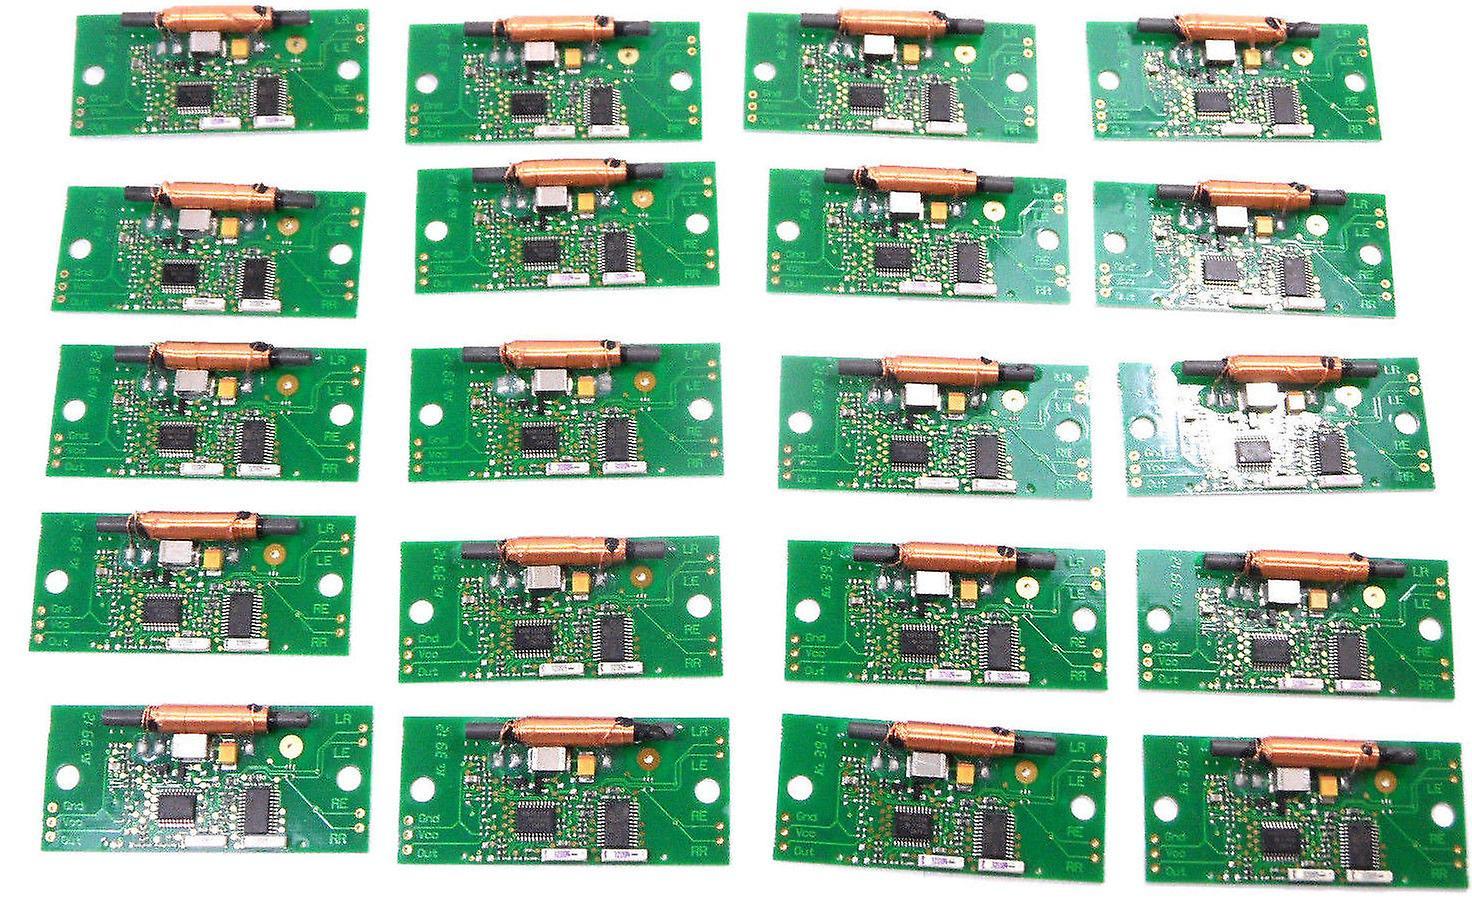 Polar 39027350.03 Circuit Board HMS_WRL_V_0 KL3912 39027350.03 Lot Of 20Pcs